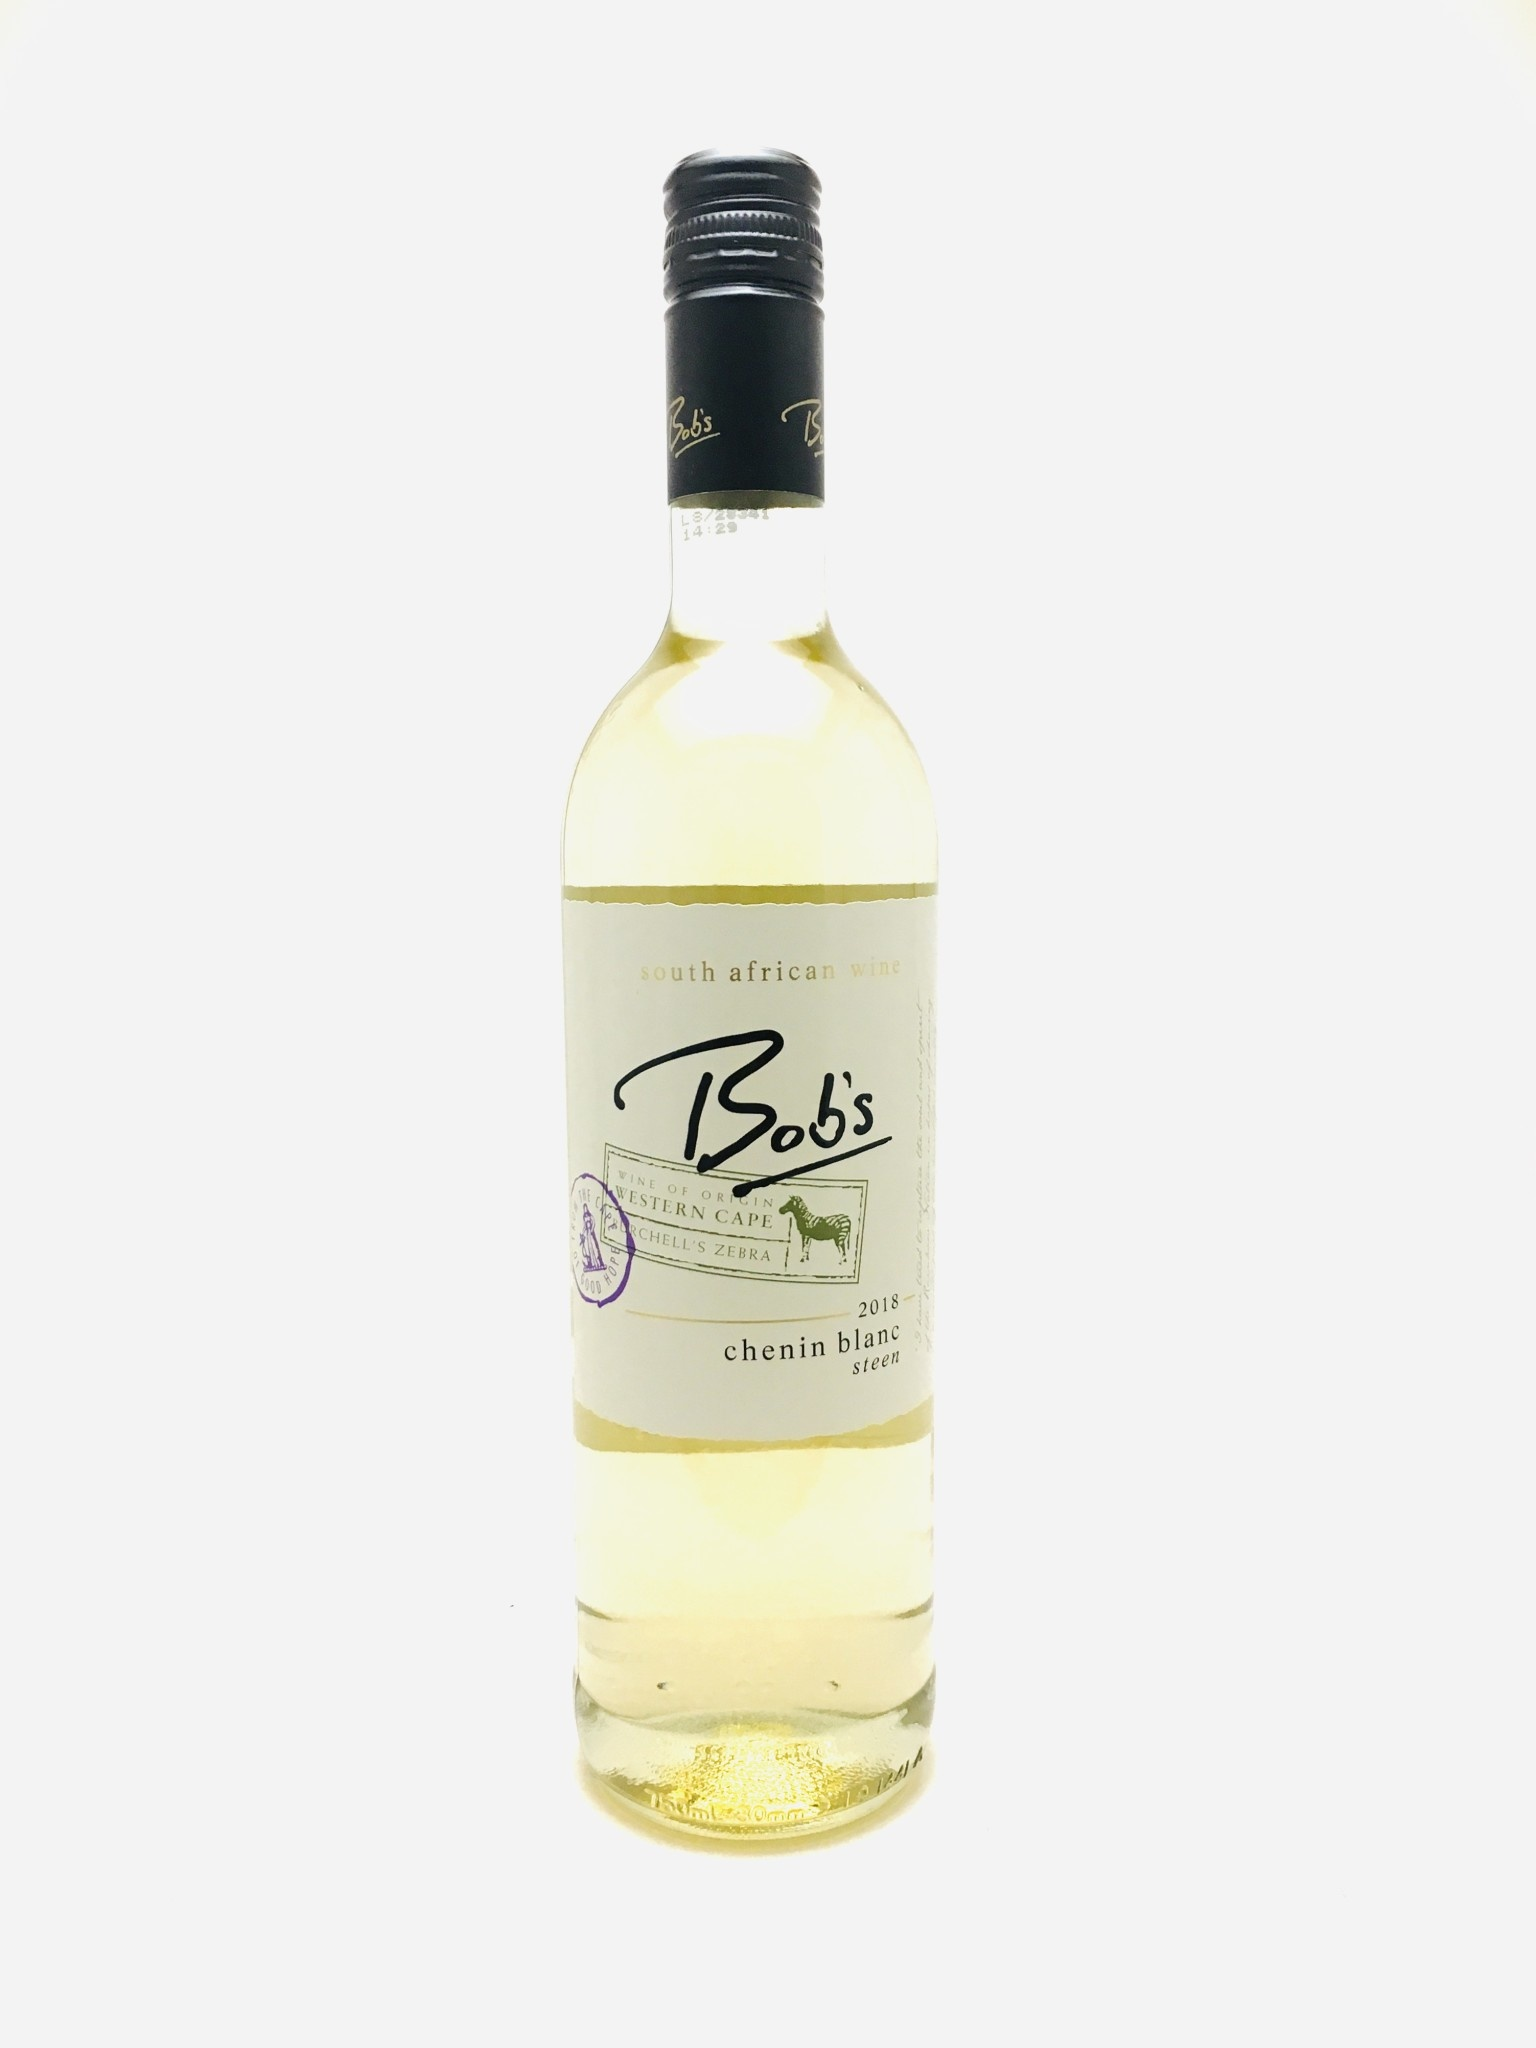 Bob's Chenin Blanc Western Cape South Africa 2019